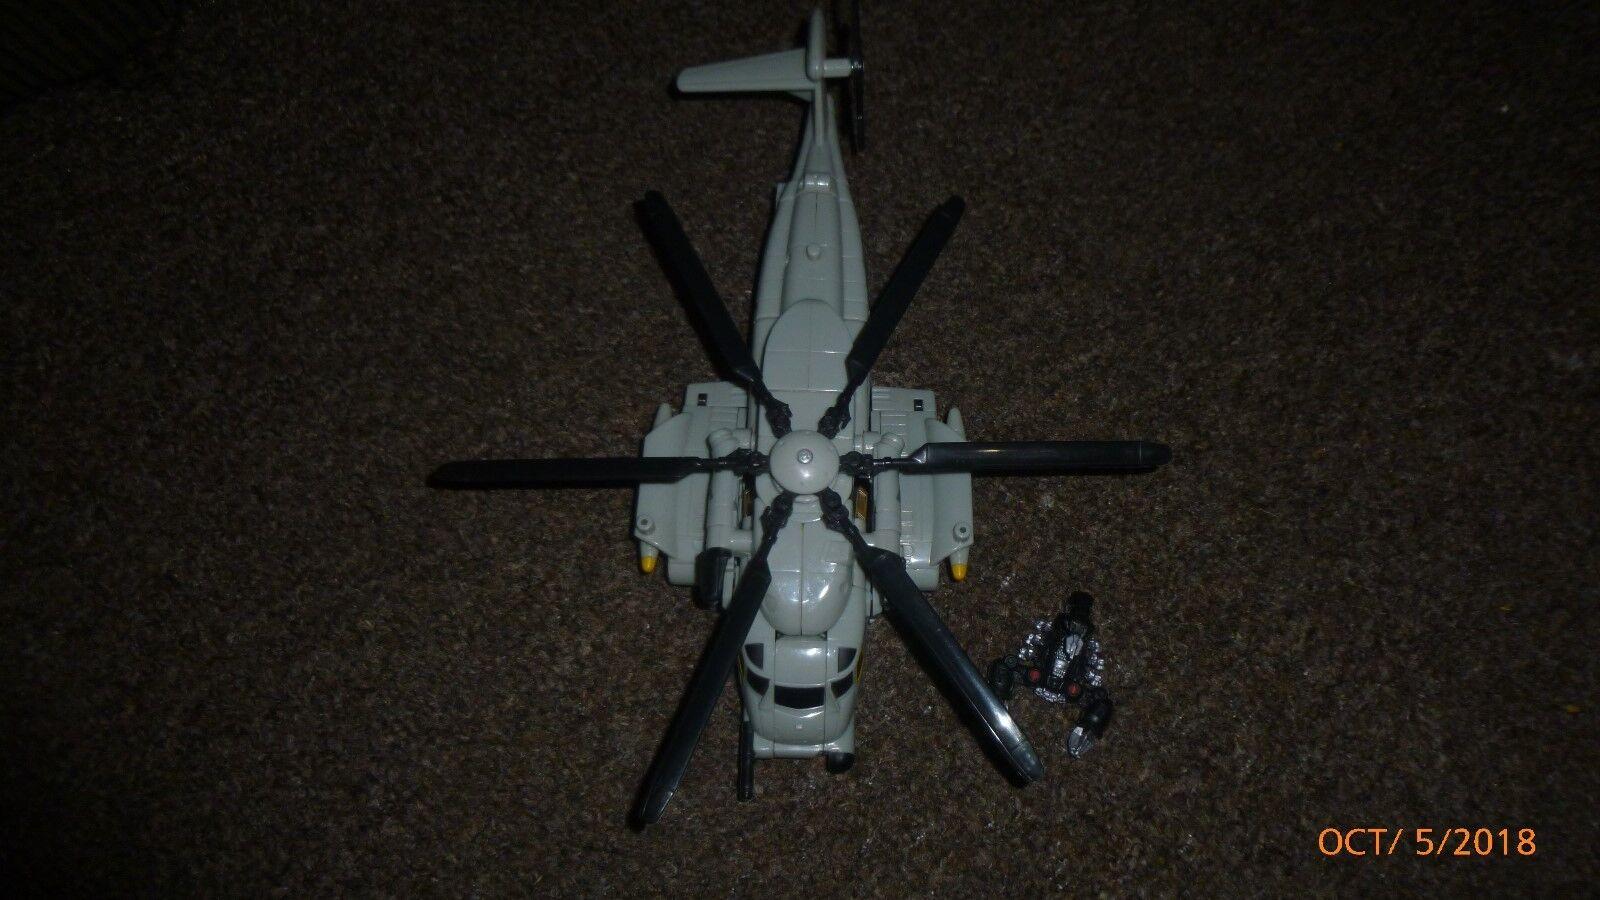 Transformers Generations Revenge of the Fallen Grindor Voyager Figure Complete